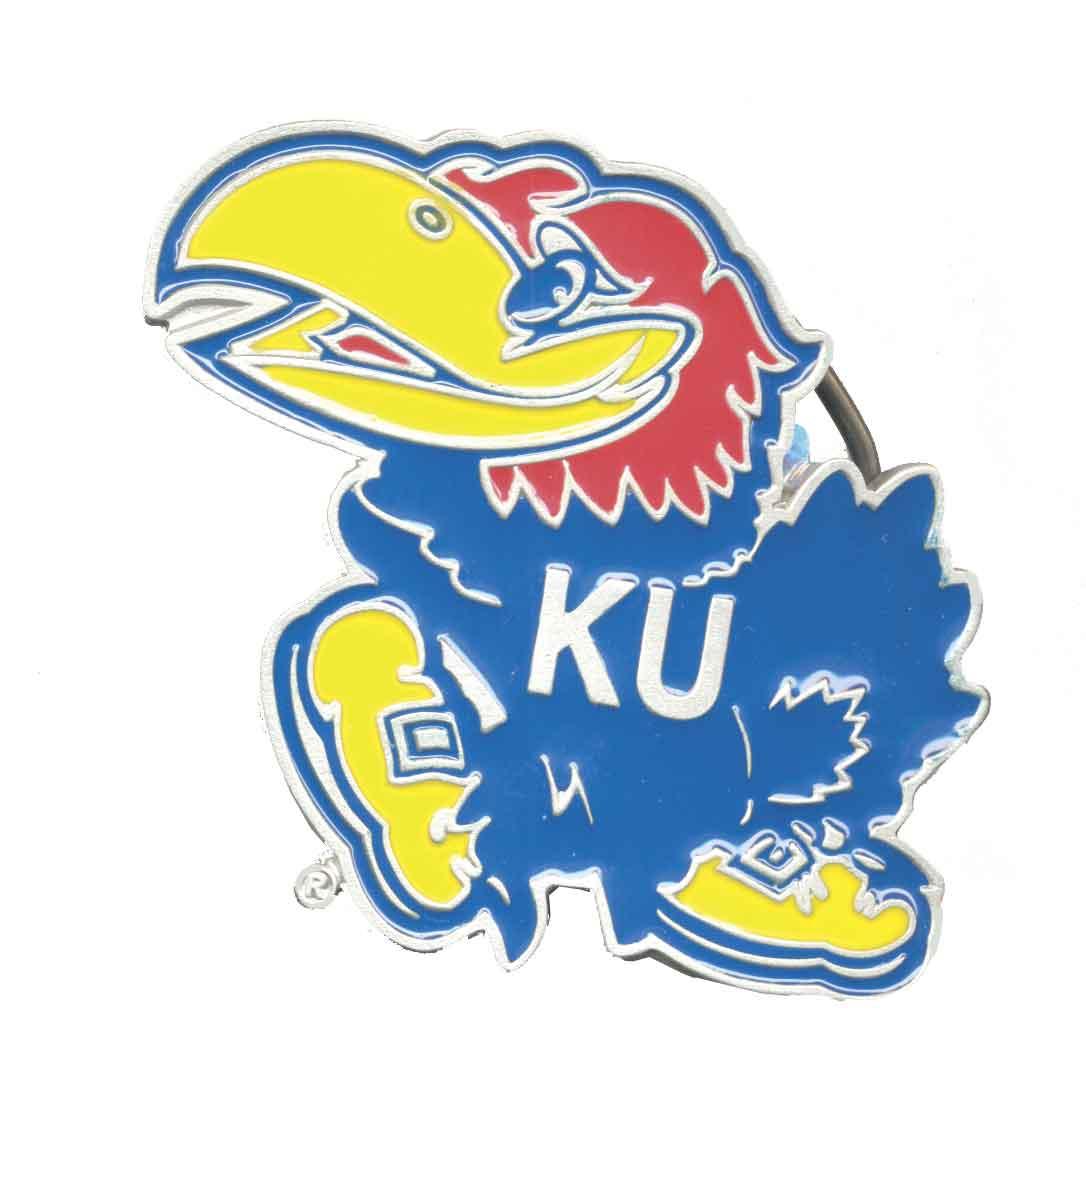 http://2.bp.blogspot.com/_YpwxlcmUXUs/S_14EyznV_I/AAAAAAAAAGY/nvlkC8e4KaA/s1600/BKL2327PC_KU_Kansas_Jayhawk.jpeg